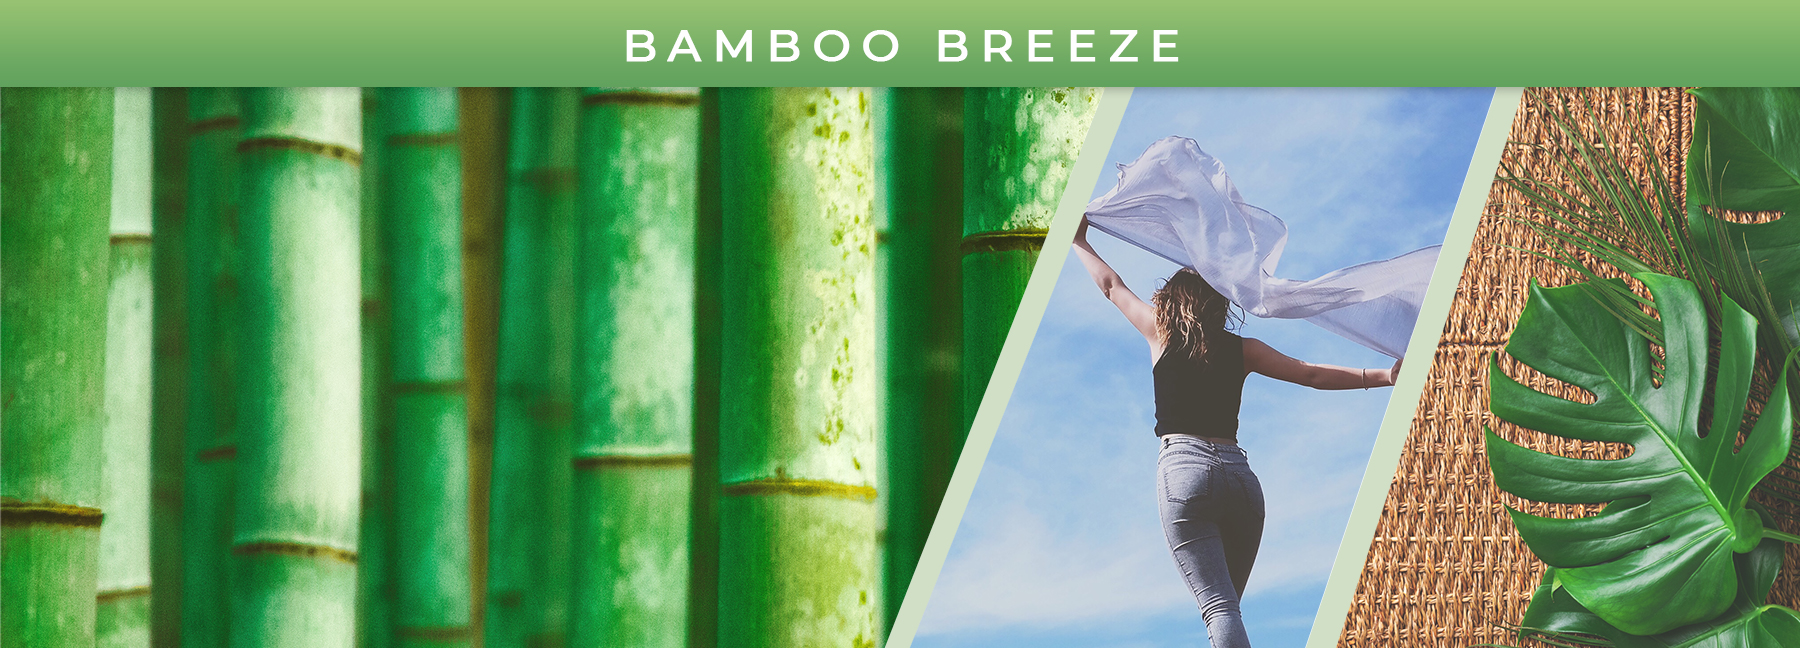 Bamboo Breeze fragrance elements